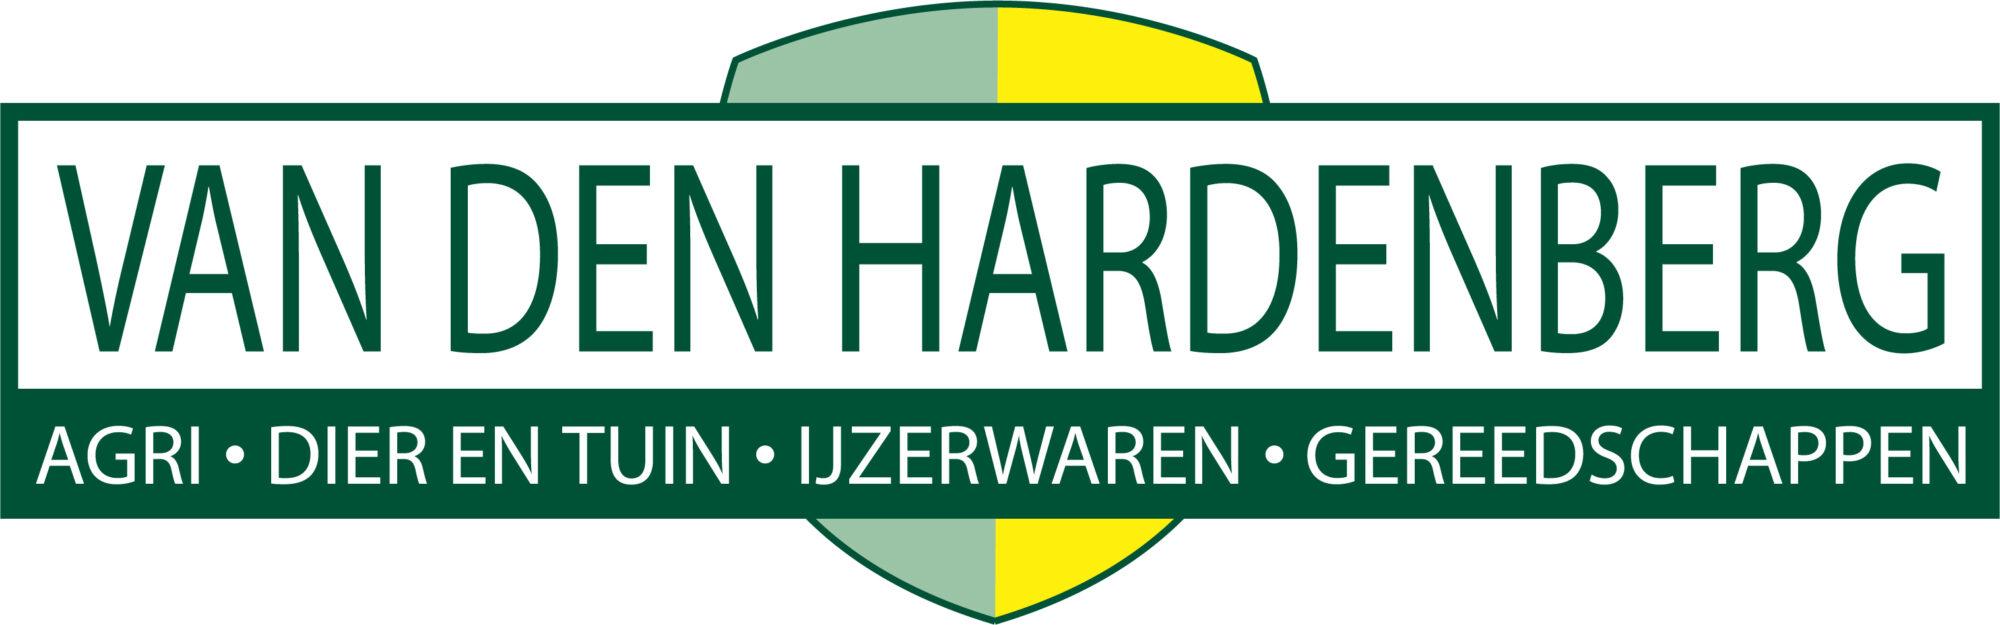 Hardenberg-Doornspijk V.O.F.